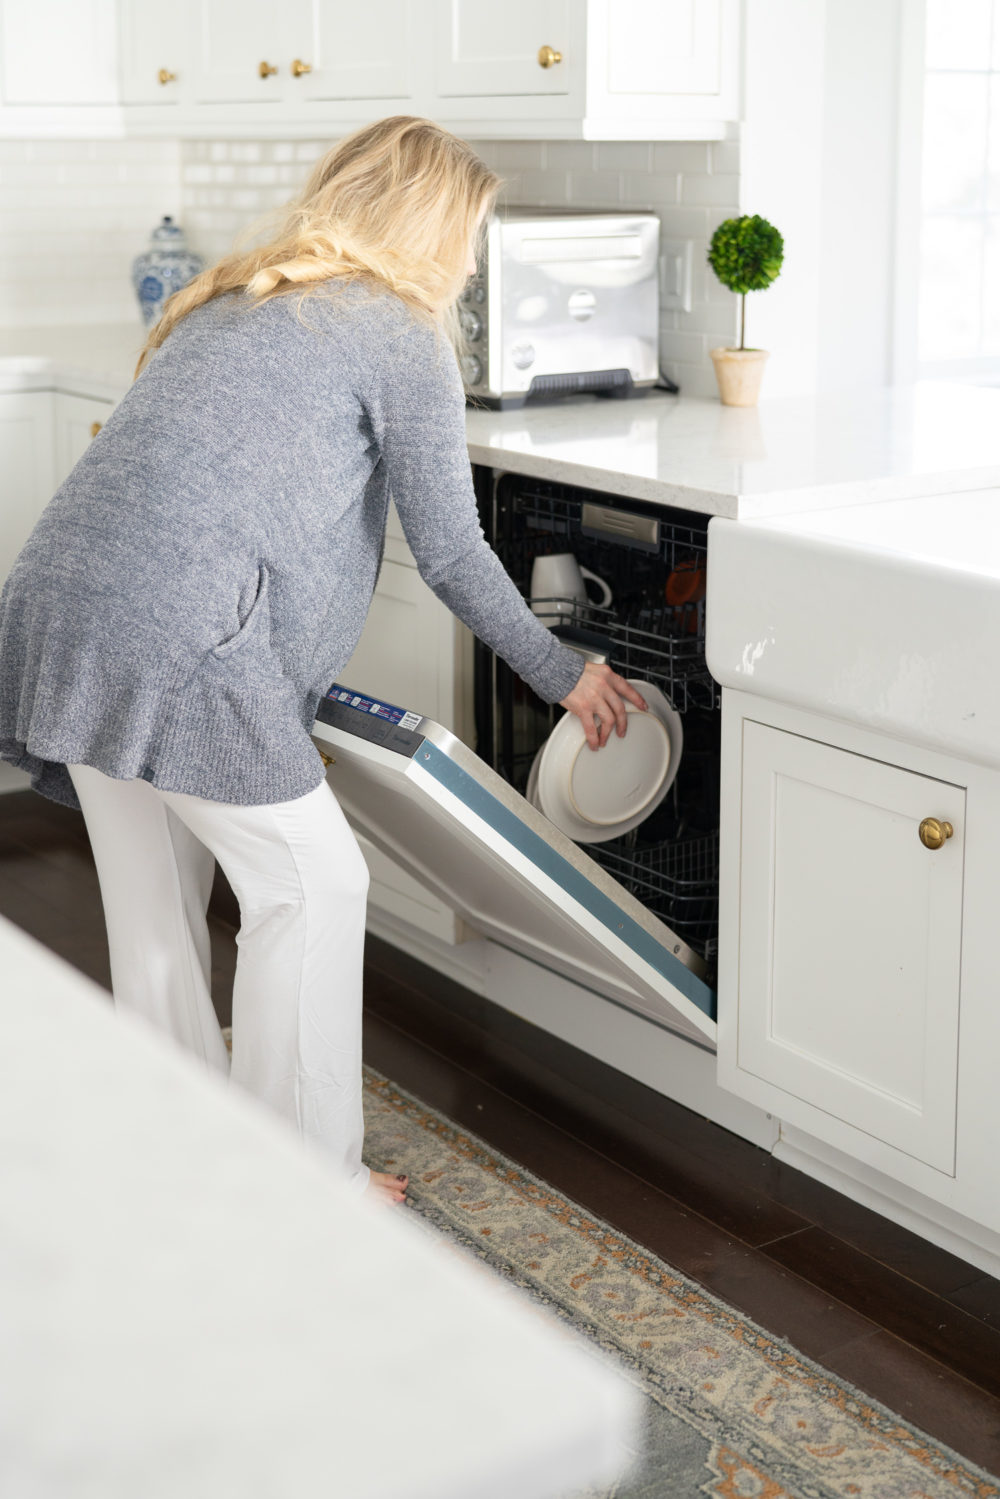 Petite Fashion Blog | eBay Home Appliances | Thermador Dishwasher